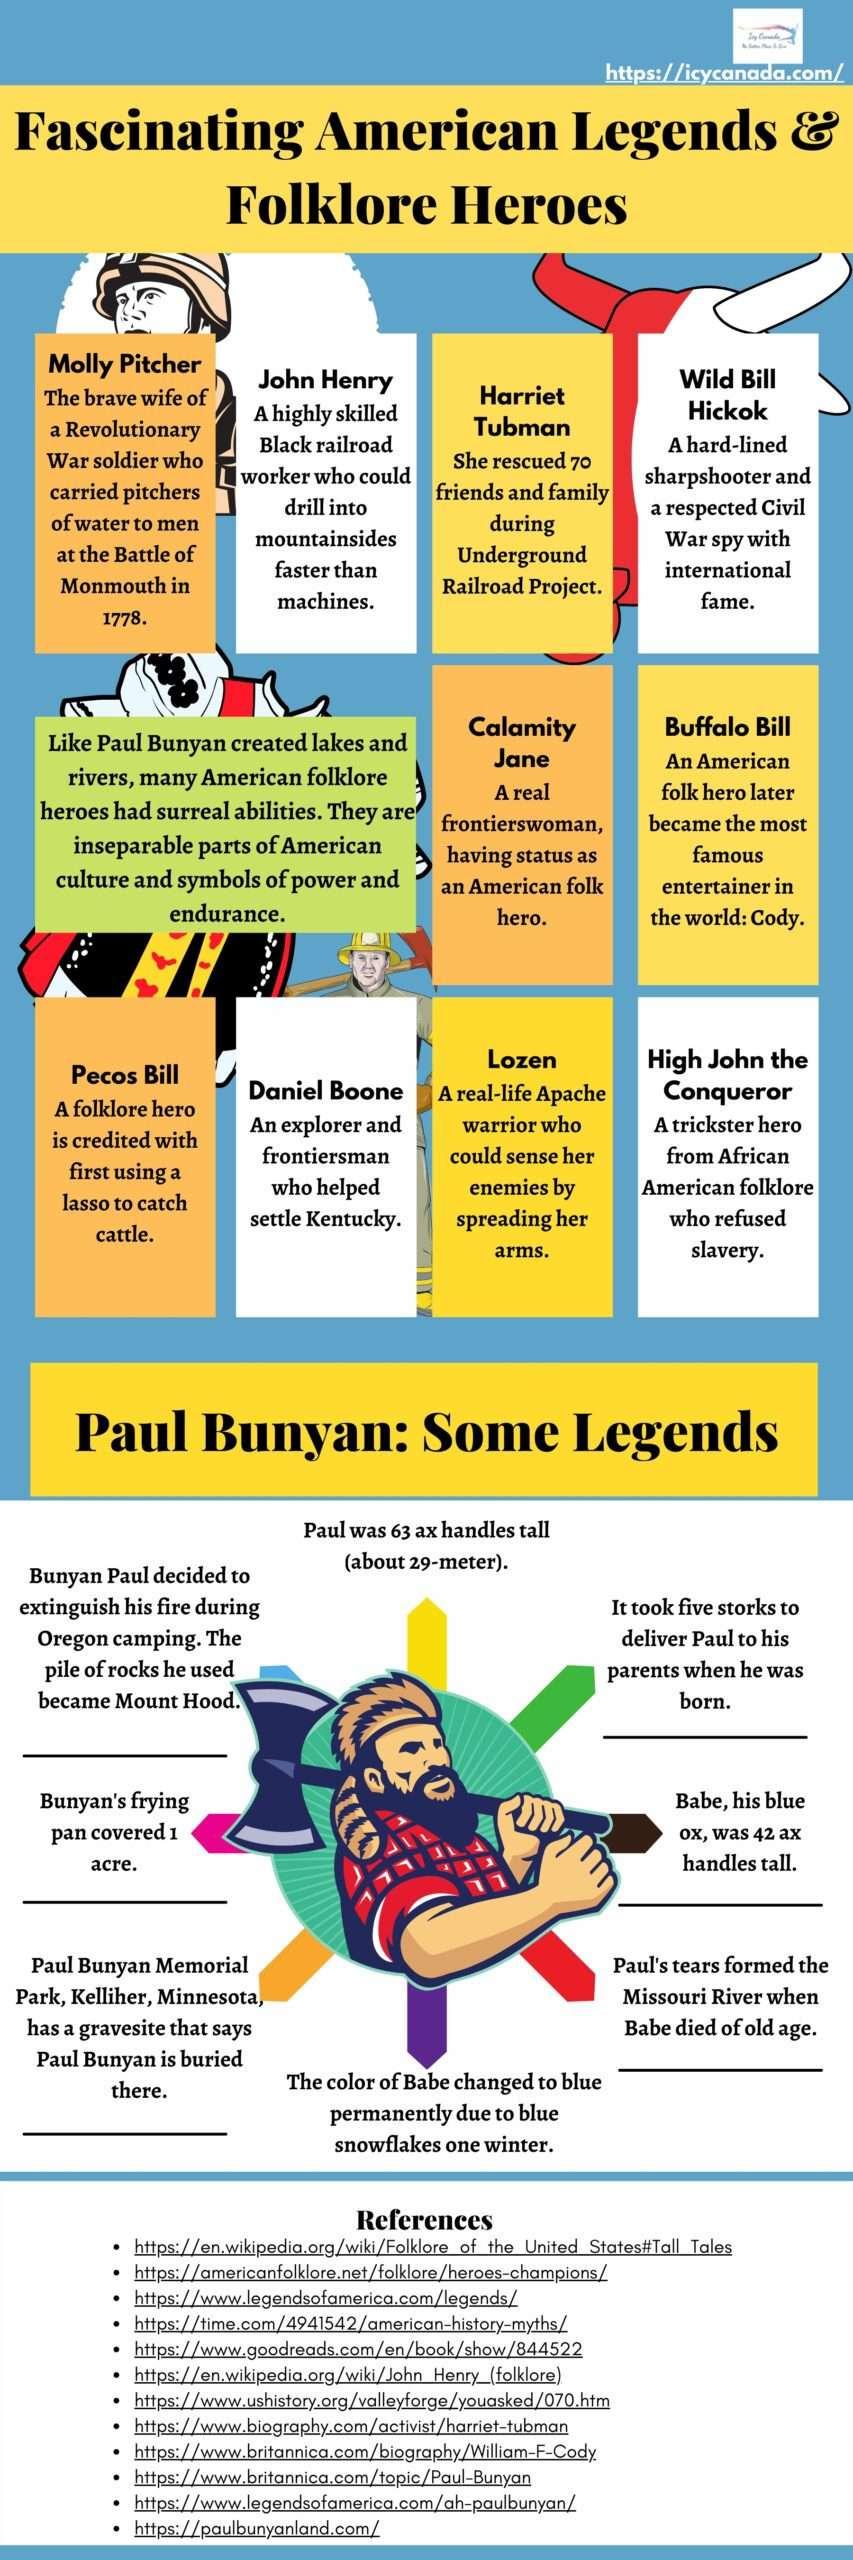 Fascinating American Legends & Folklore Heroes